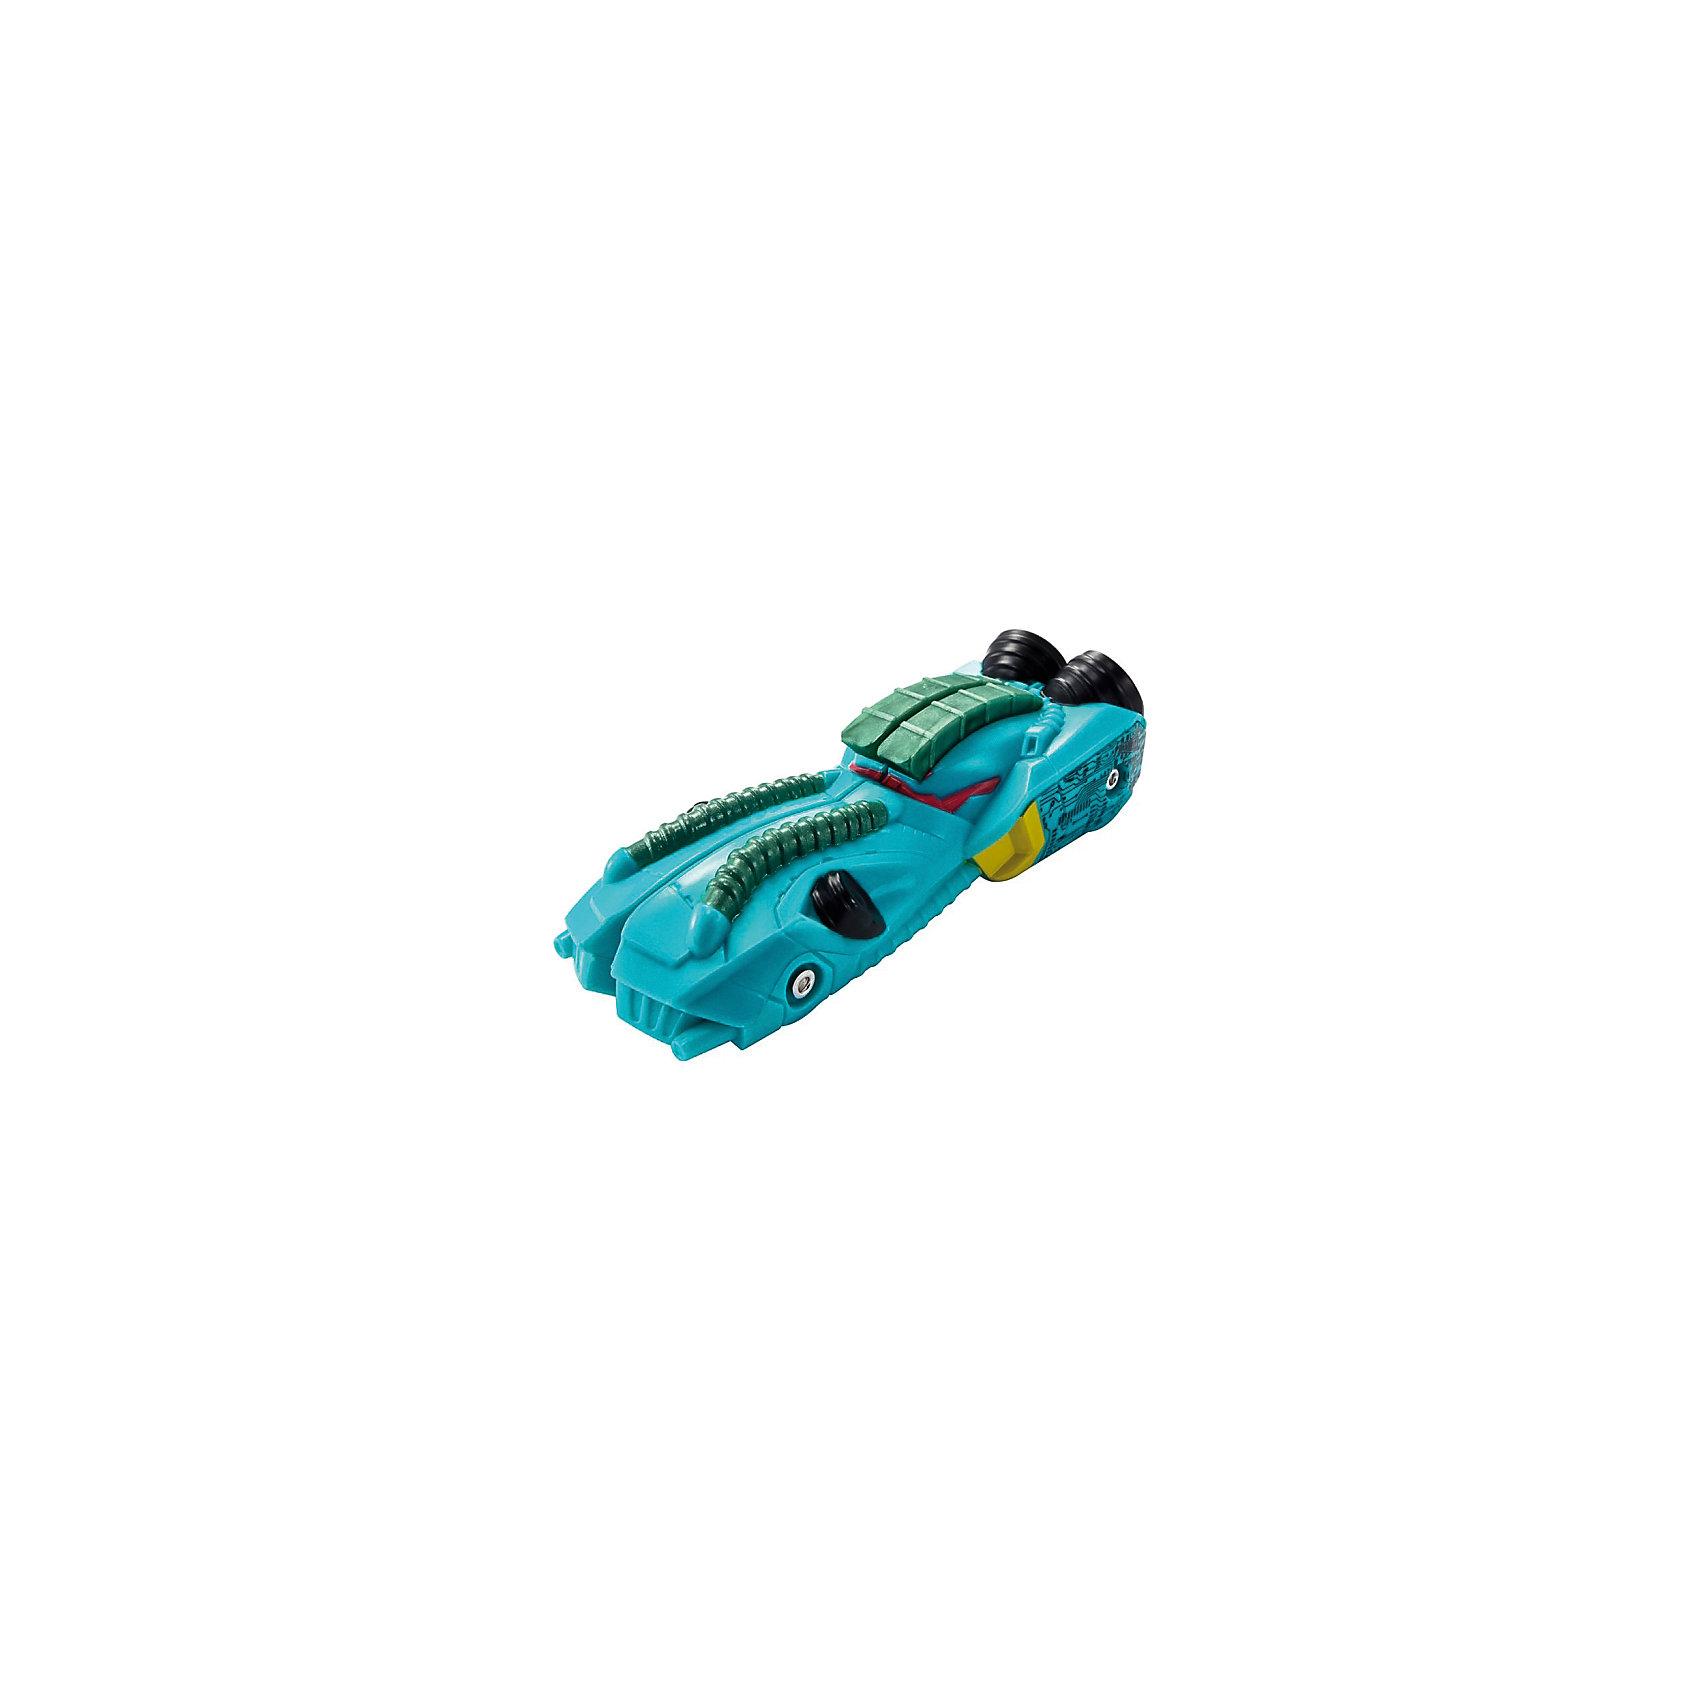 "Mattel Машинка ""Разделяющиеся гонщики"", Hot Wheels"